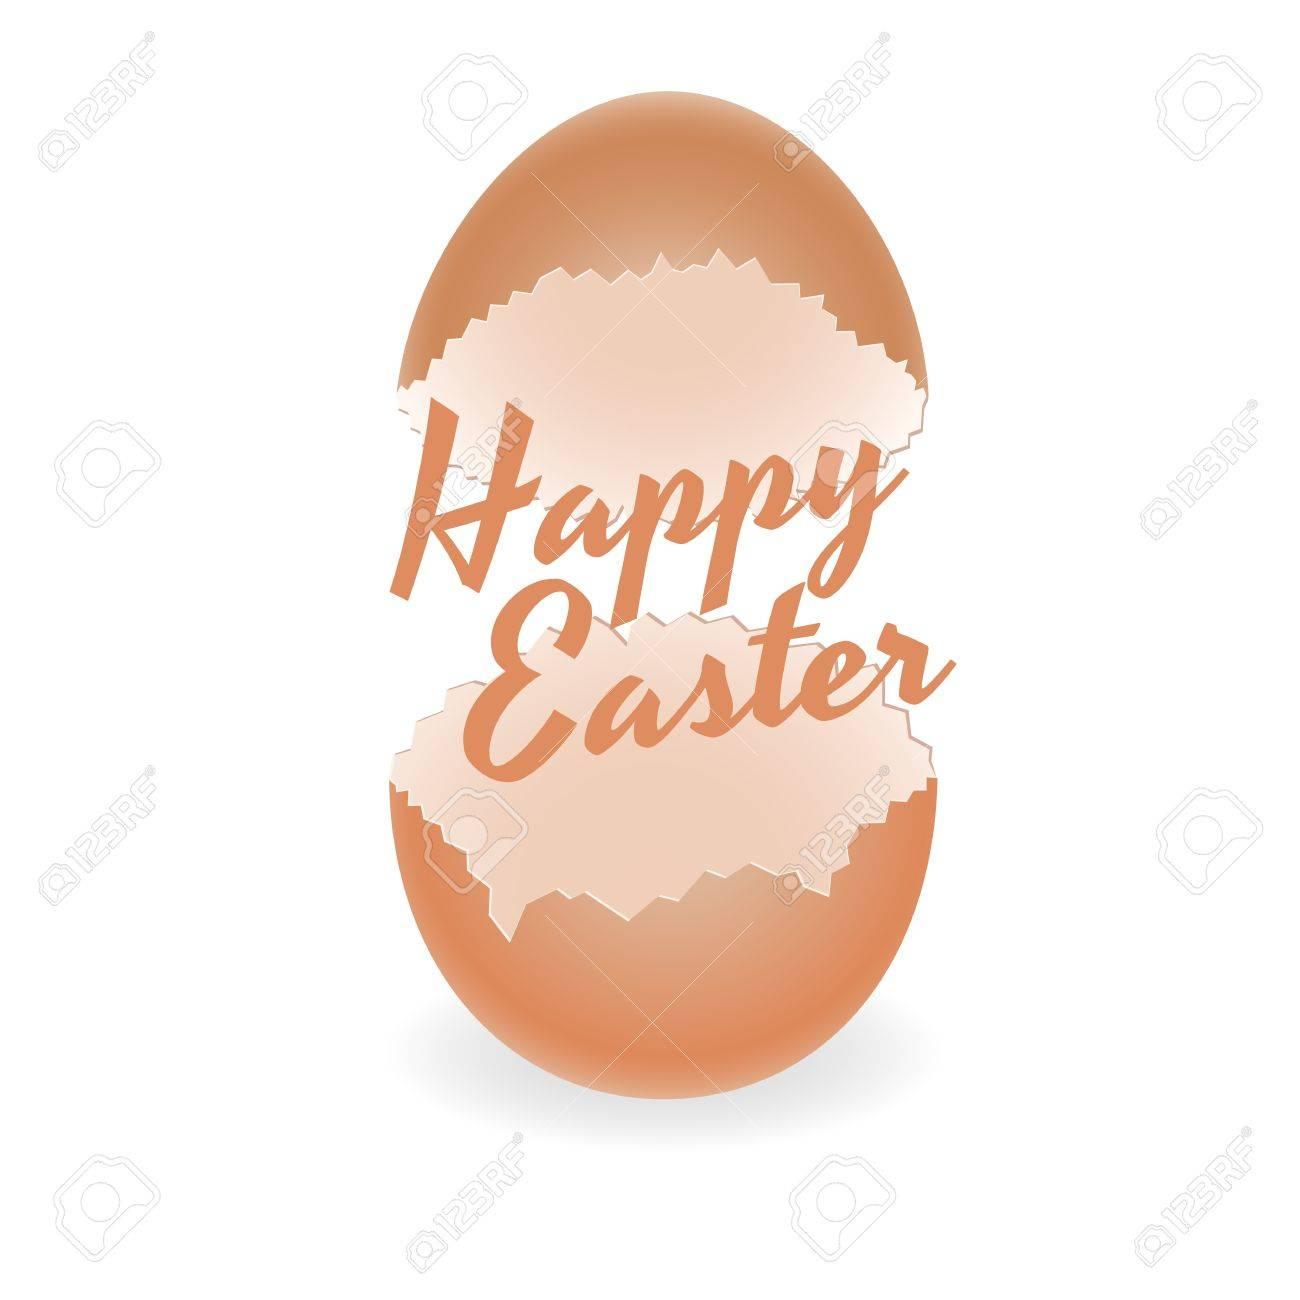 Broken Egg Shell Royalty Free Cliparts, Vectors, And Stock ...